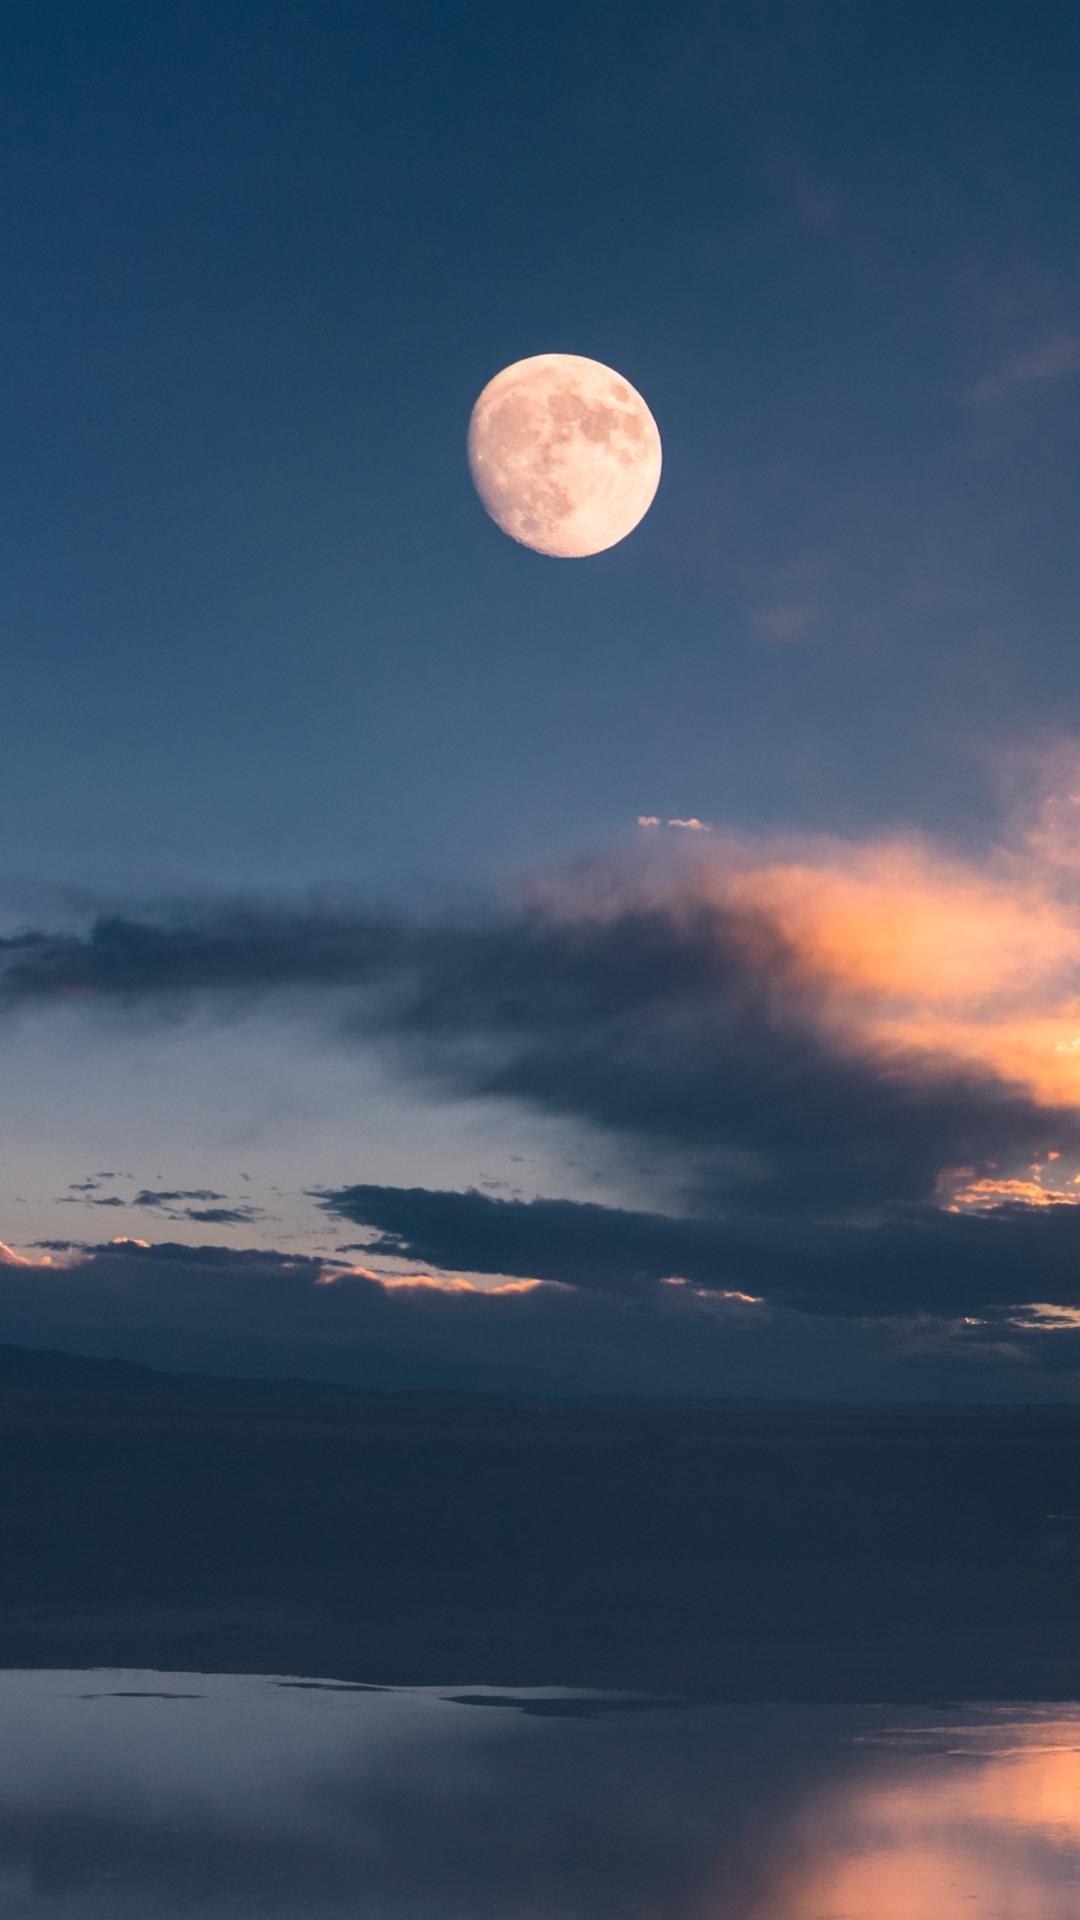 Gannan Maqu Lake Clouds Sky Moon China 1080x1920